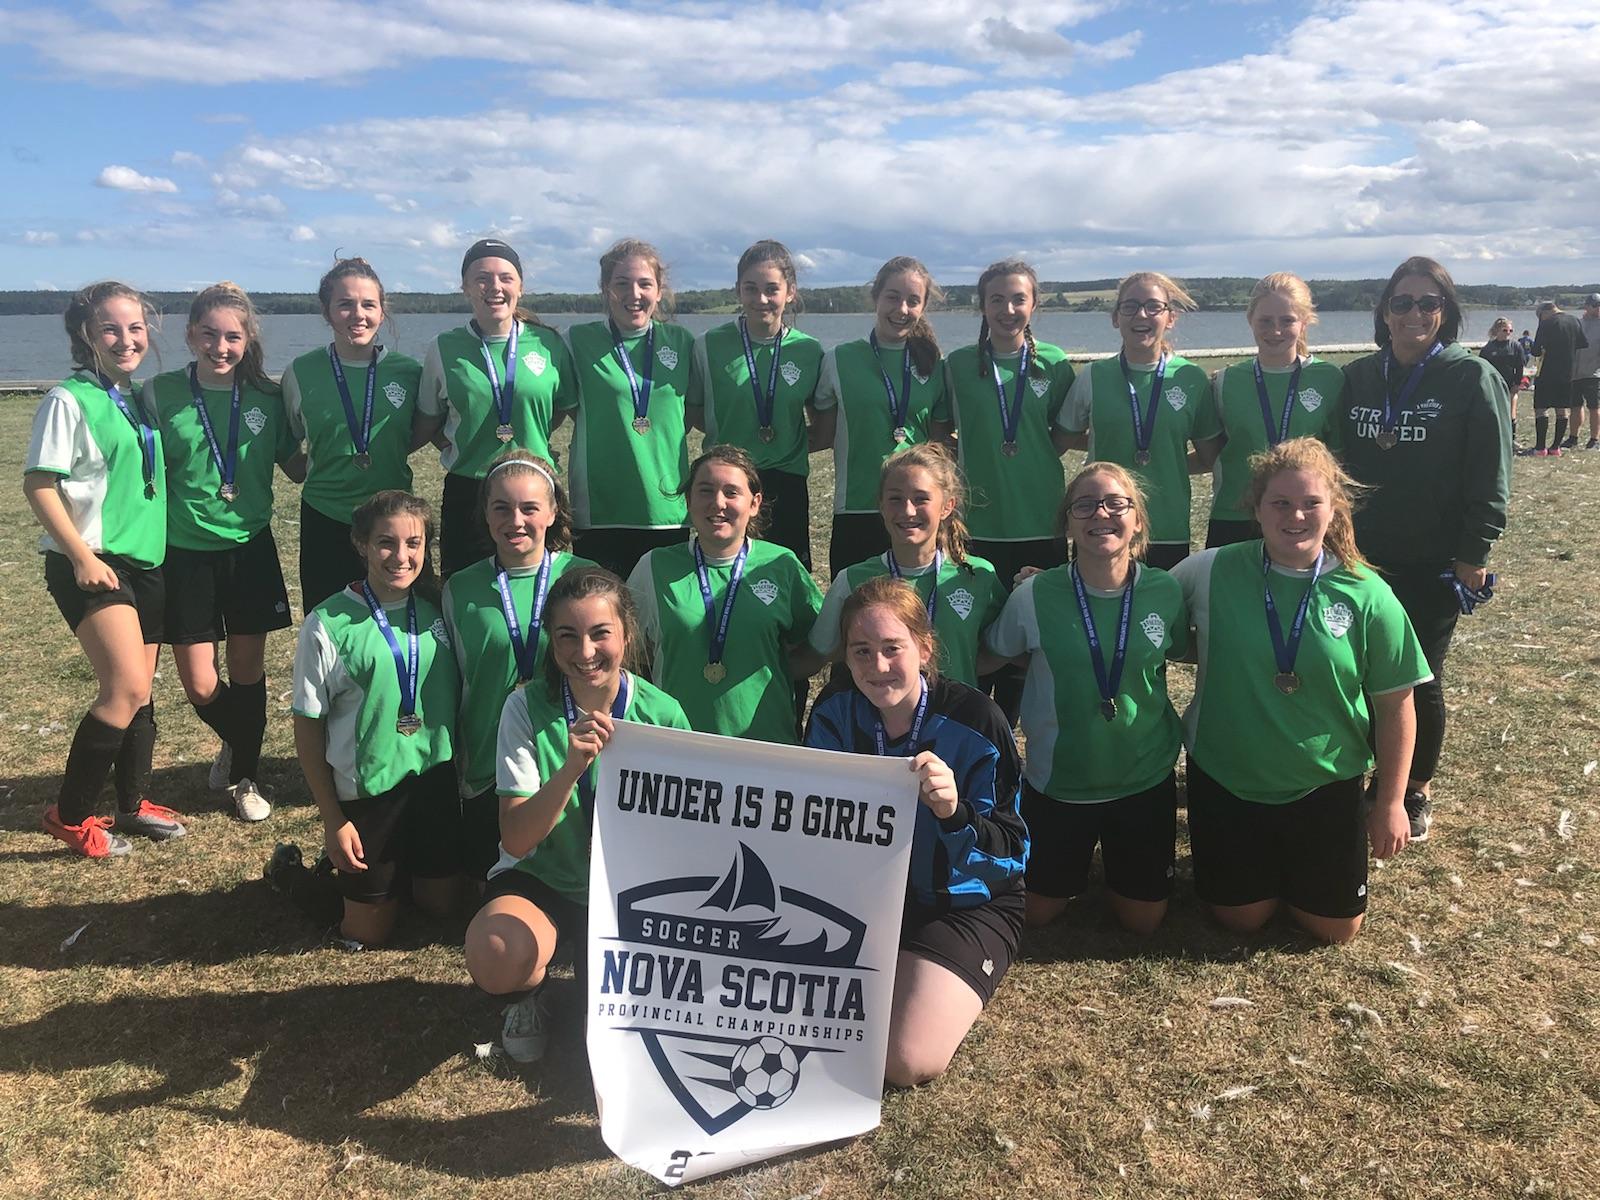 15UB girls soccer provincials results (from North Sydney Sunday)